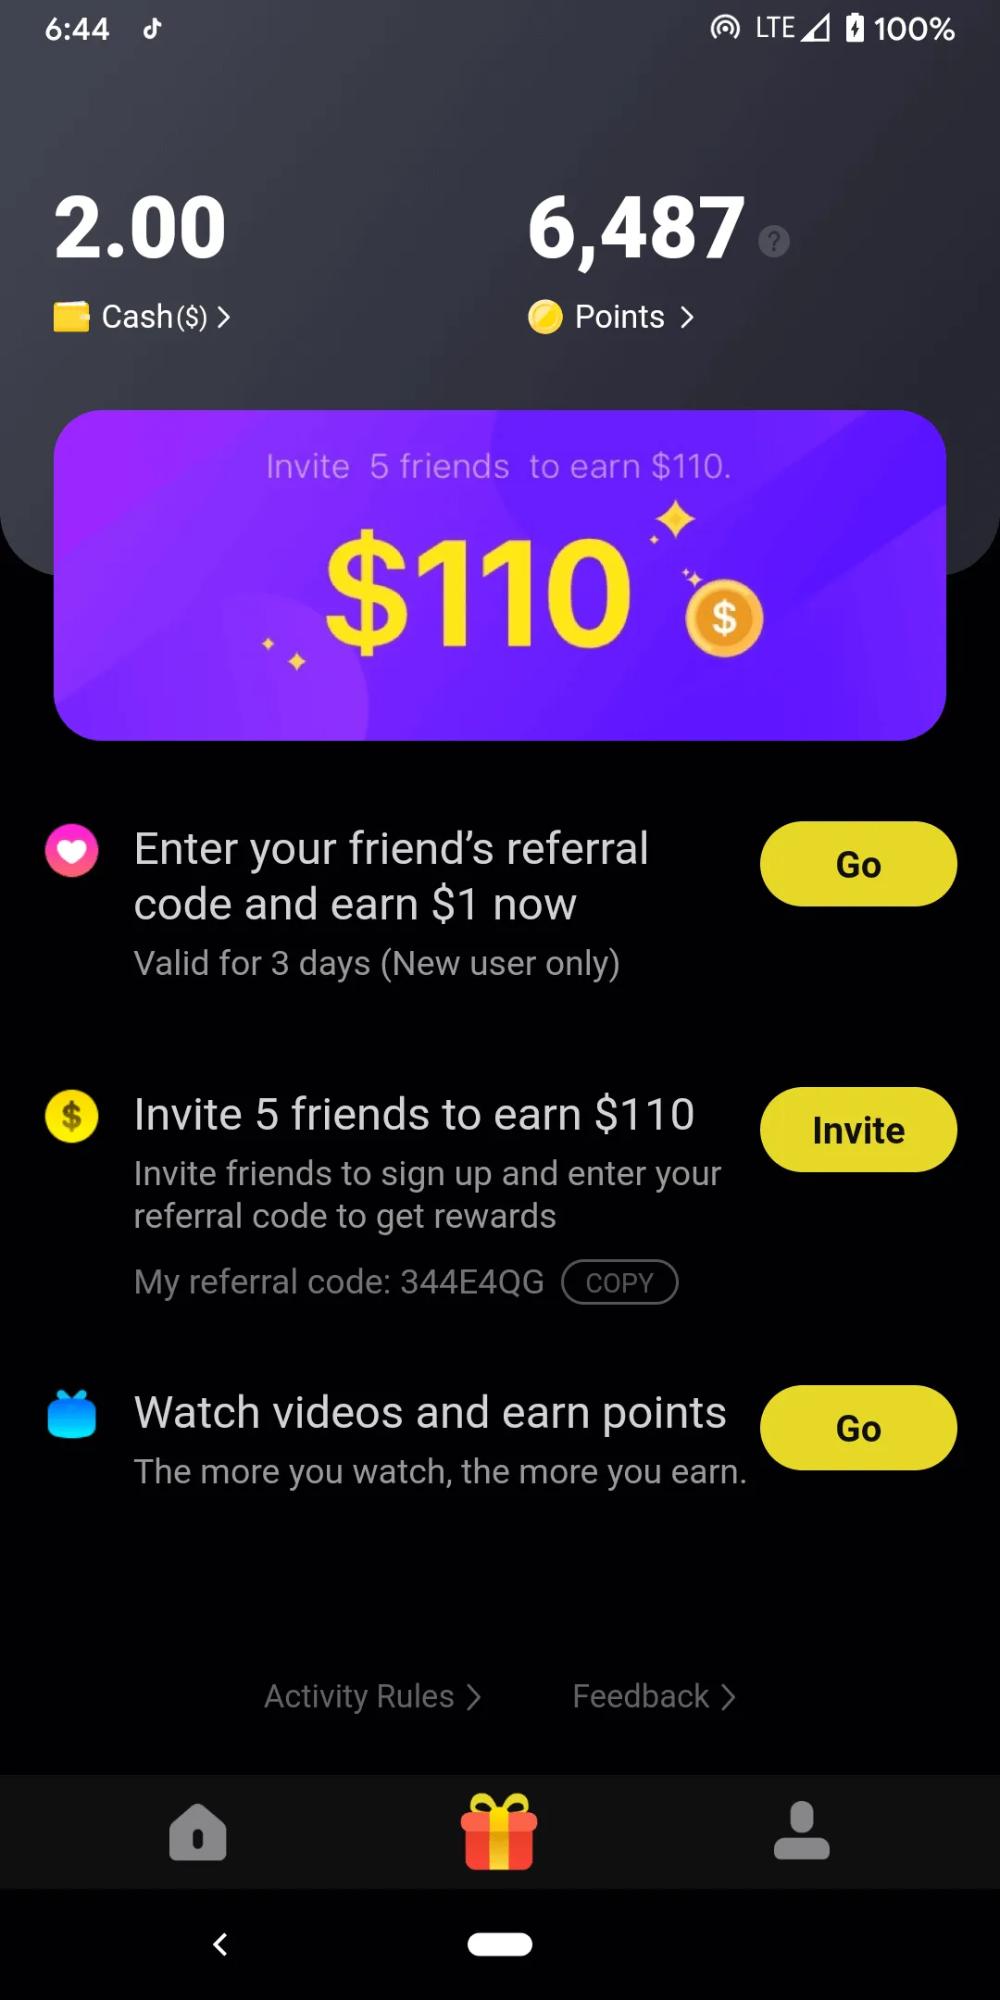 Earn Money Watching Videos On Your Phone Zynn App Review Gamer Dollars Incomeideas Entrepreneurship Friend Referral Online Marketing Training Earn Money